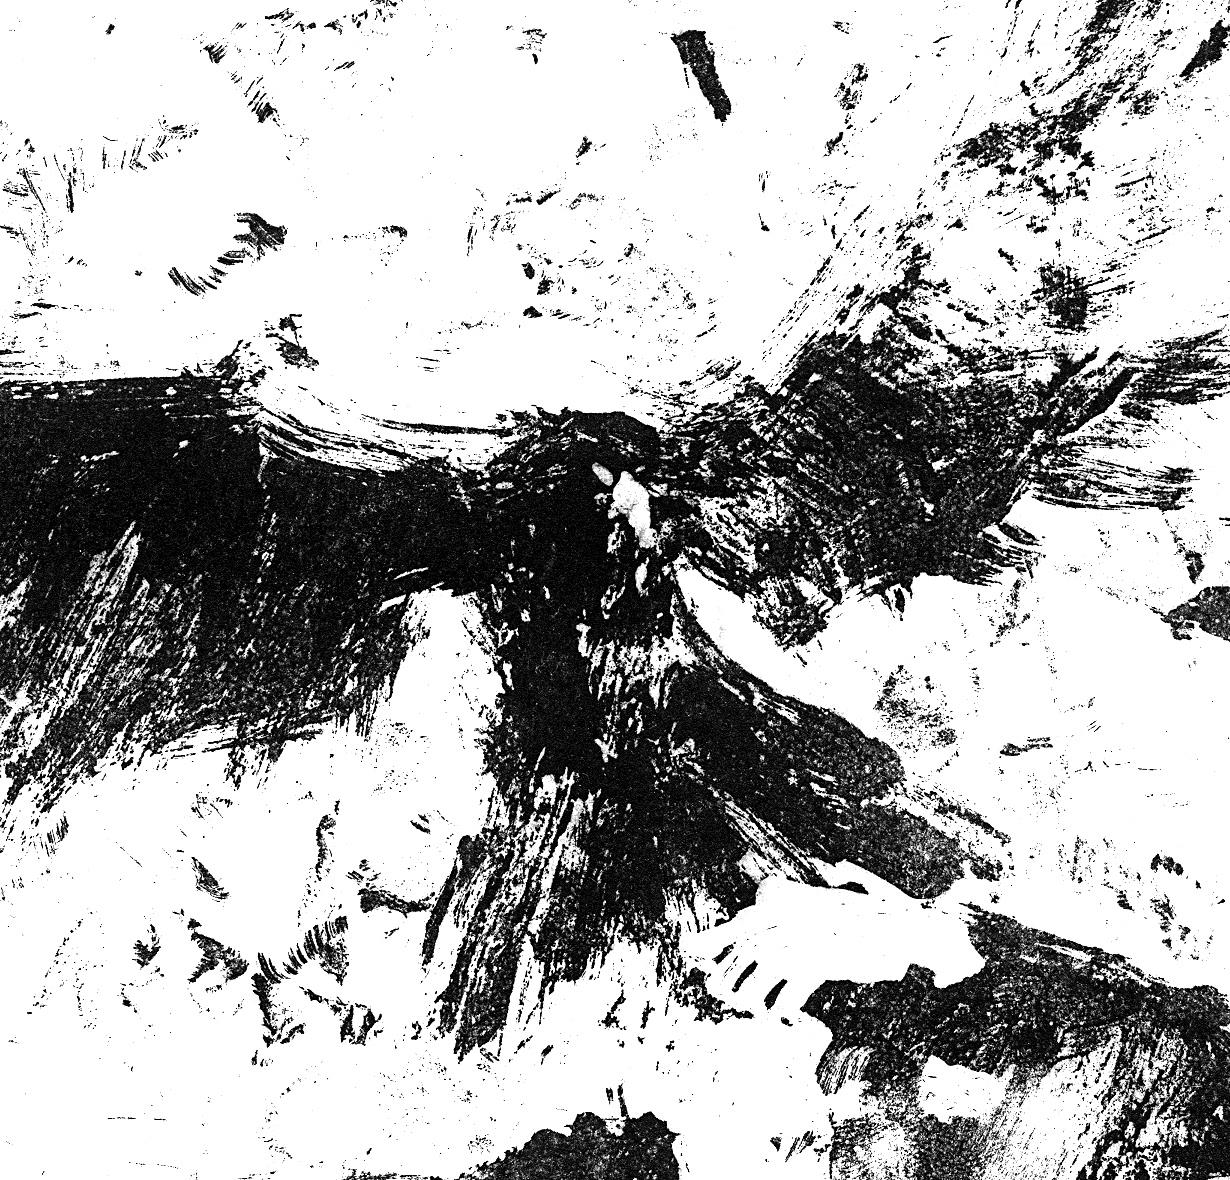 Edgar Allan Poe The Raven | Varnas